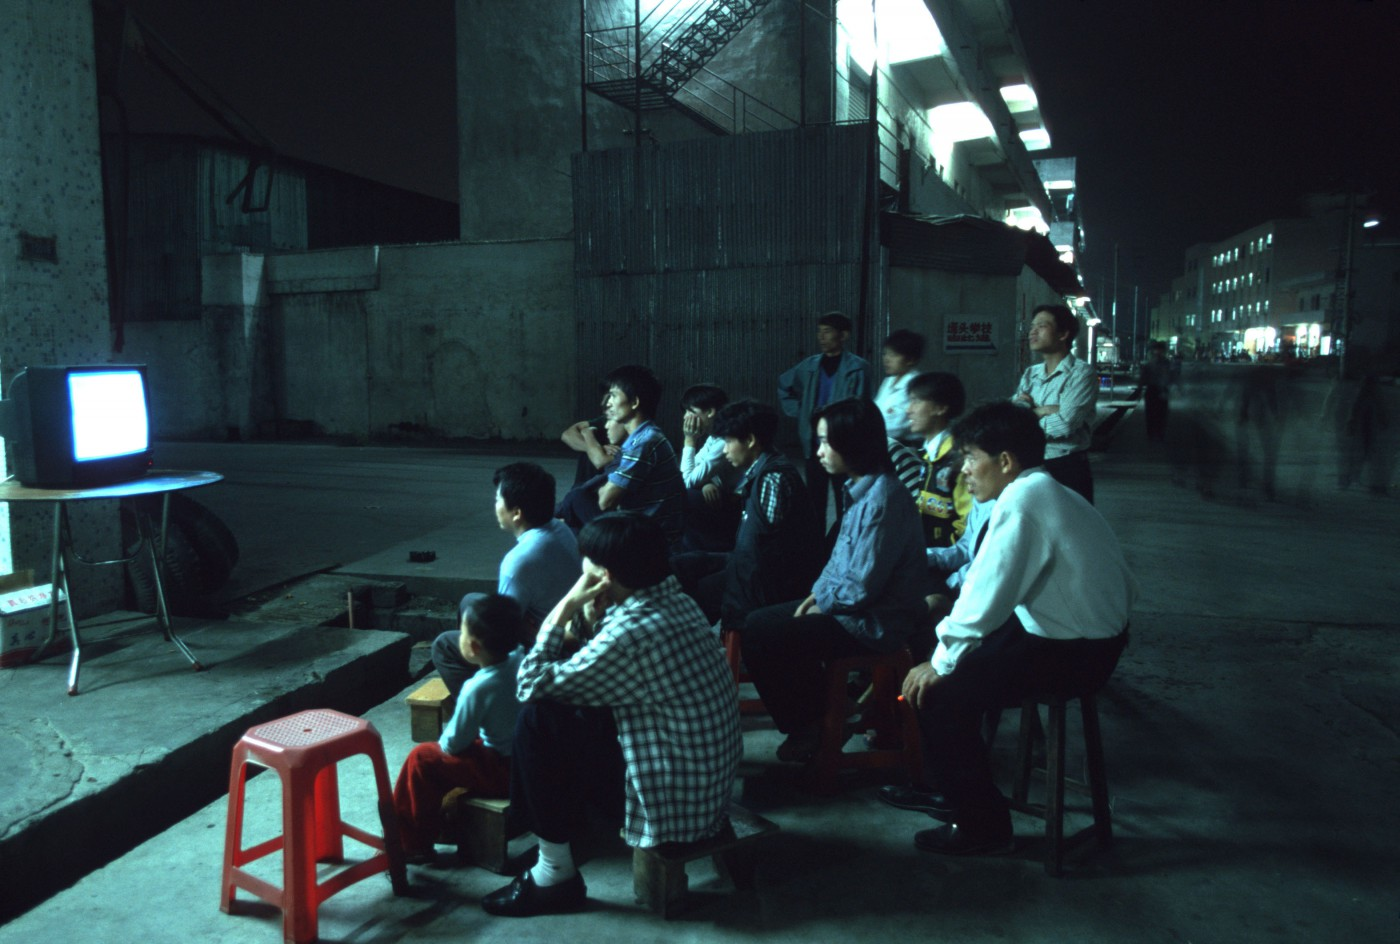 Greg Girard, </span><span><em>Factory Workers Watching TV, Shenzhen, 2000</em>, </span><span>30 x 40 inches